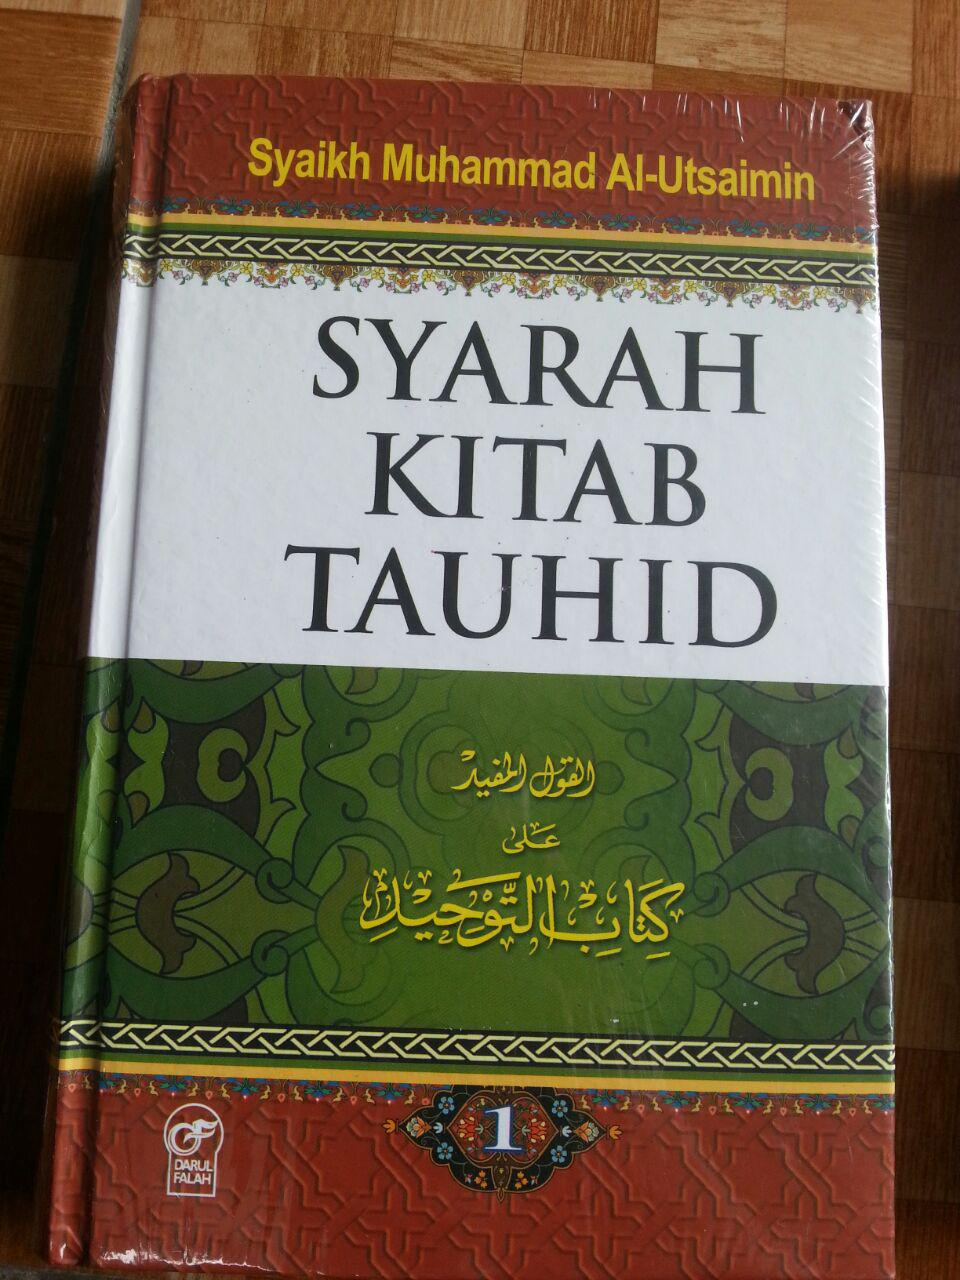 Buku Syarah Kitab Tauhid 1 Set 2 Jilid cover 3